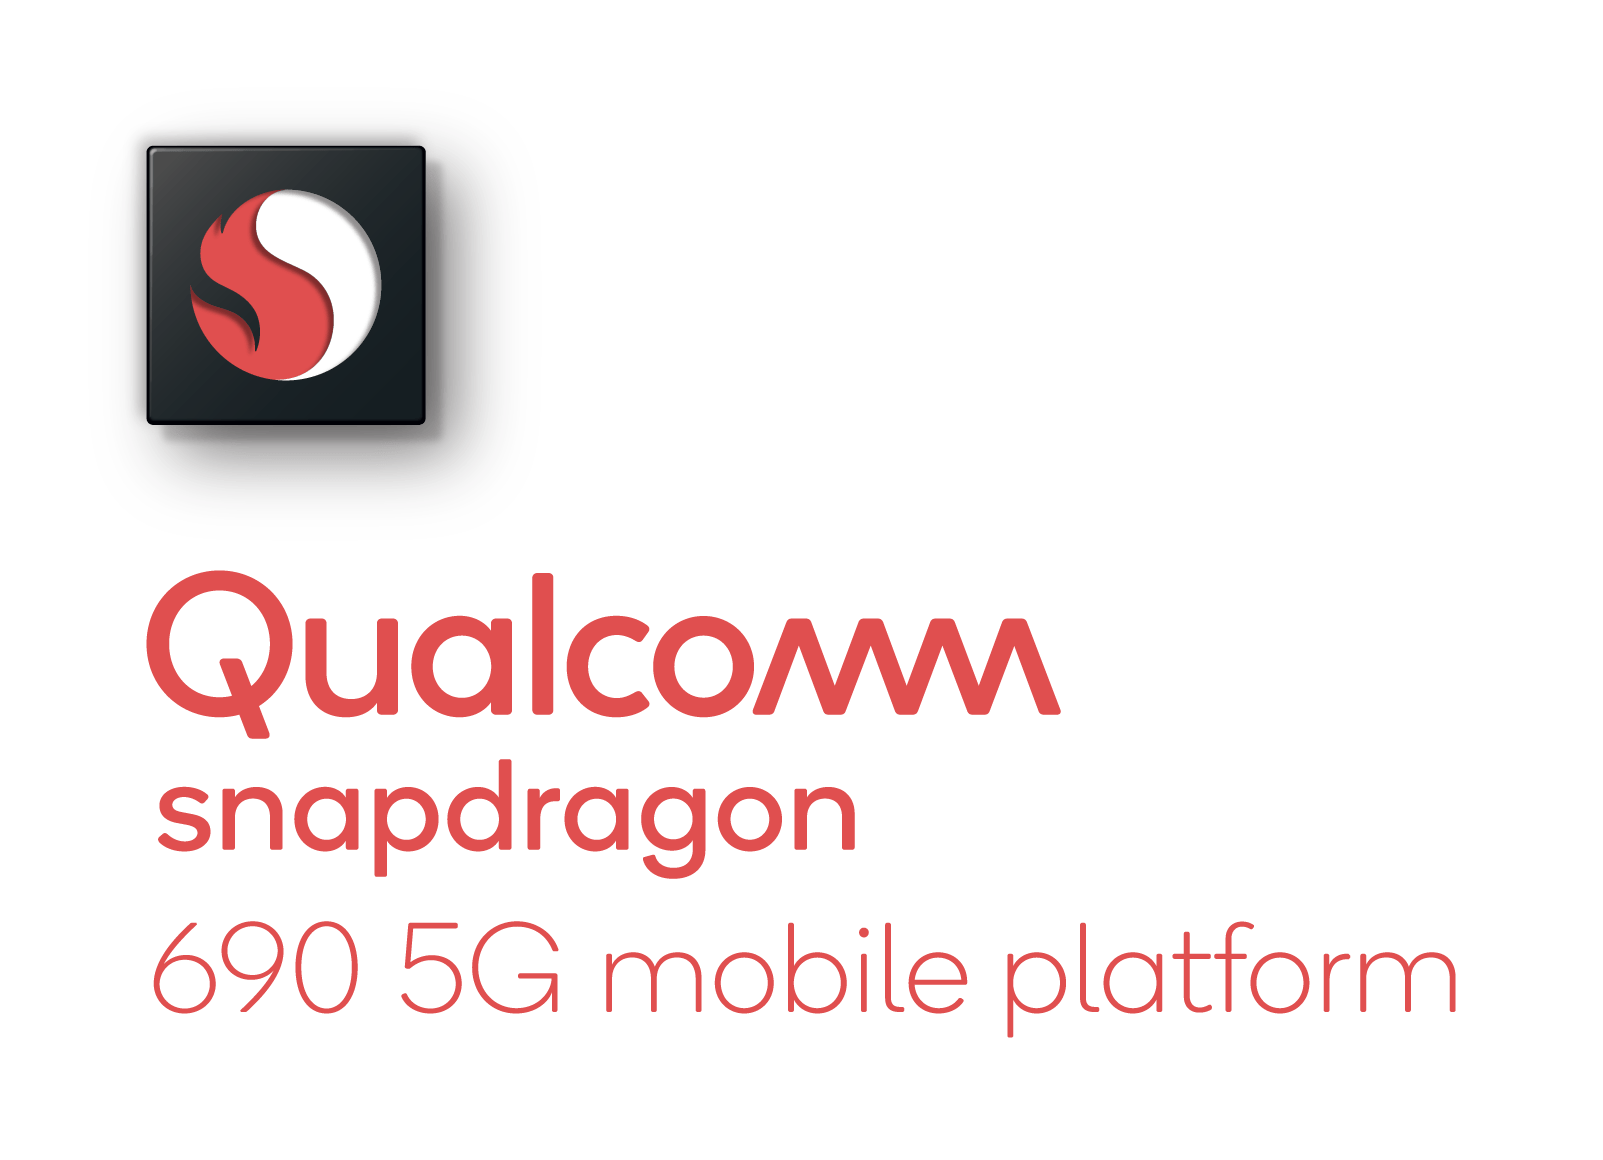 Snapdragon 690 5Gに上位モデルが存在か、Galaxy A42 5GがGeekbenchに登場